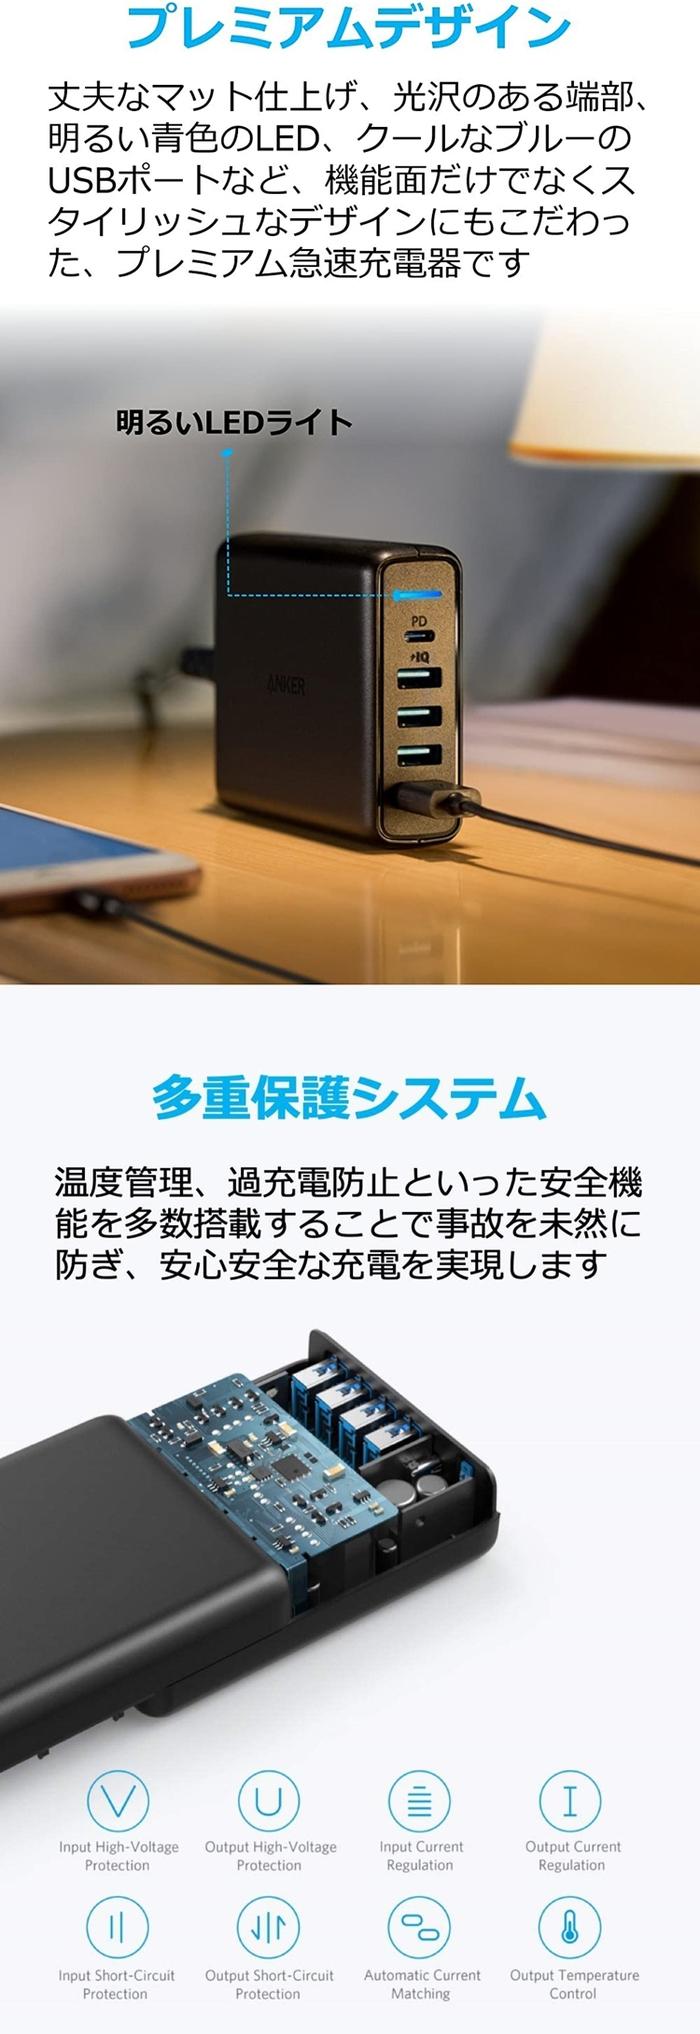 美國Anker PowerPort PD+IQ 60W 5埠USB充電器 ( A205651x )